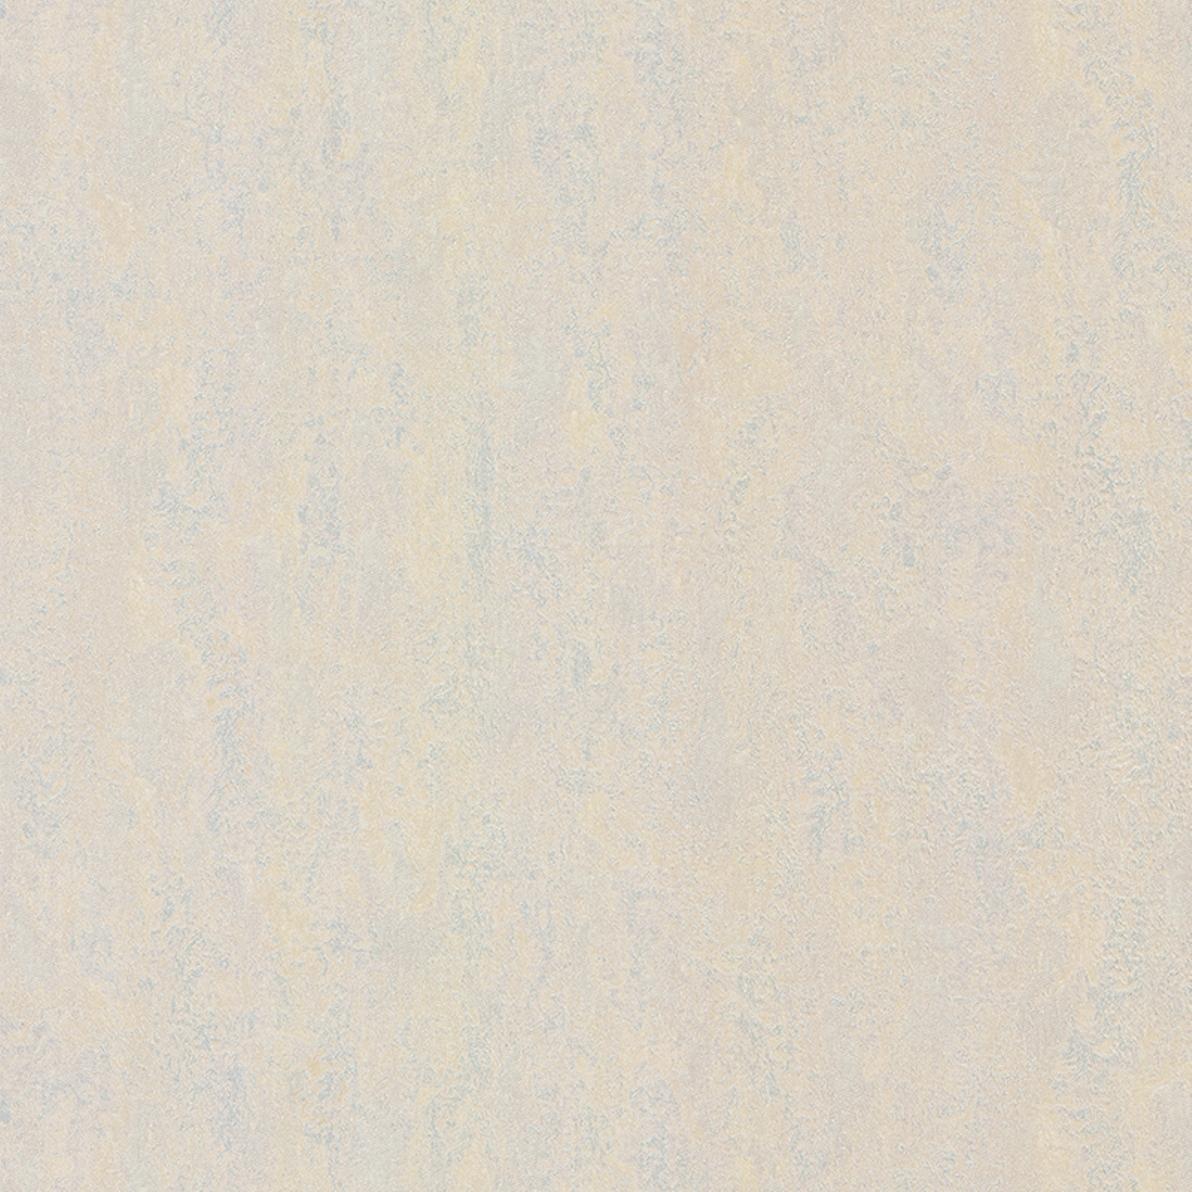 Обои Decori & Decori Bukhara 82790